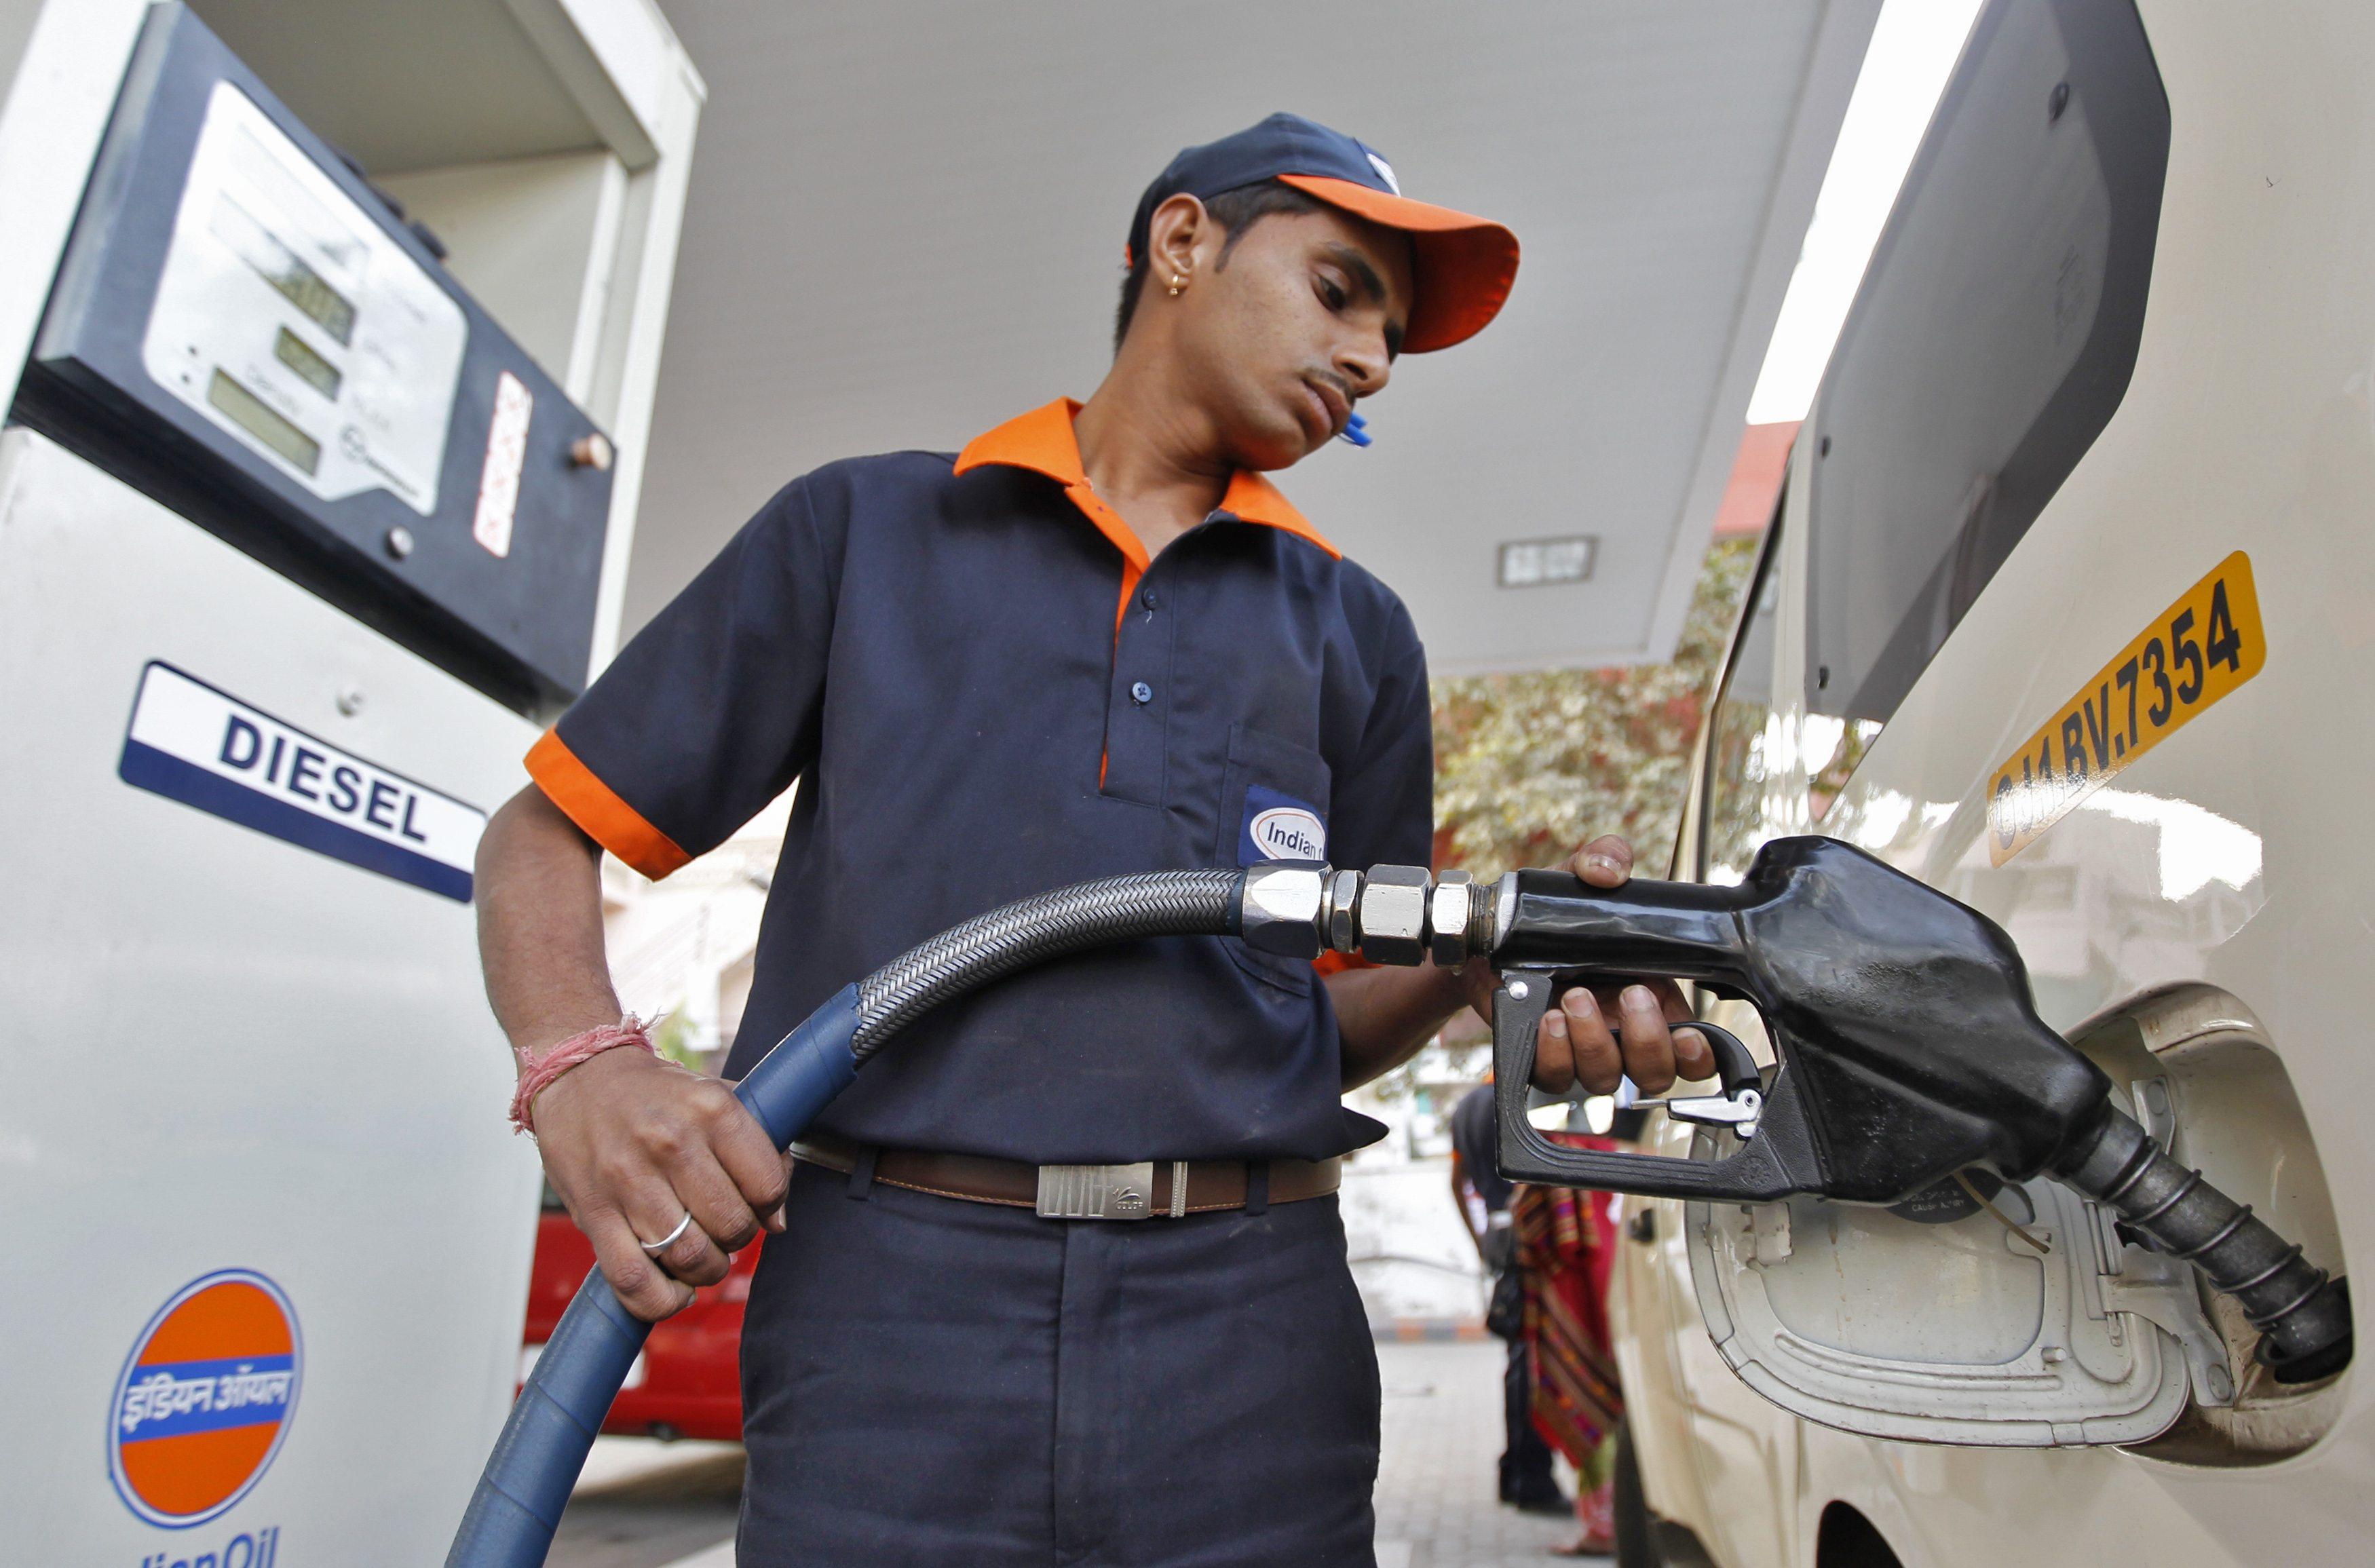 petrol, Diesel, India, Arun Jaitley, BJP, price hike, economy, Indian economy